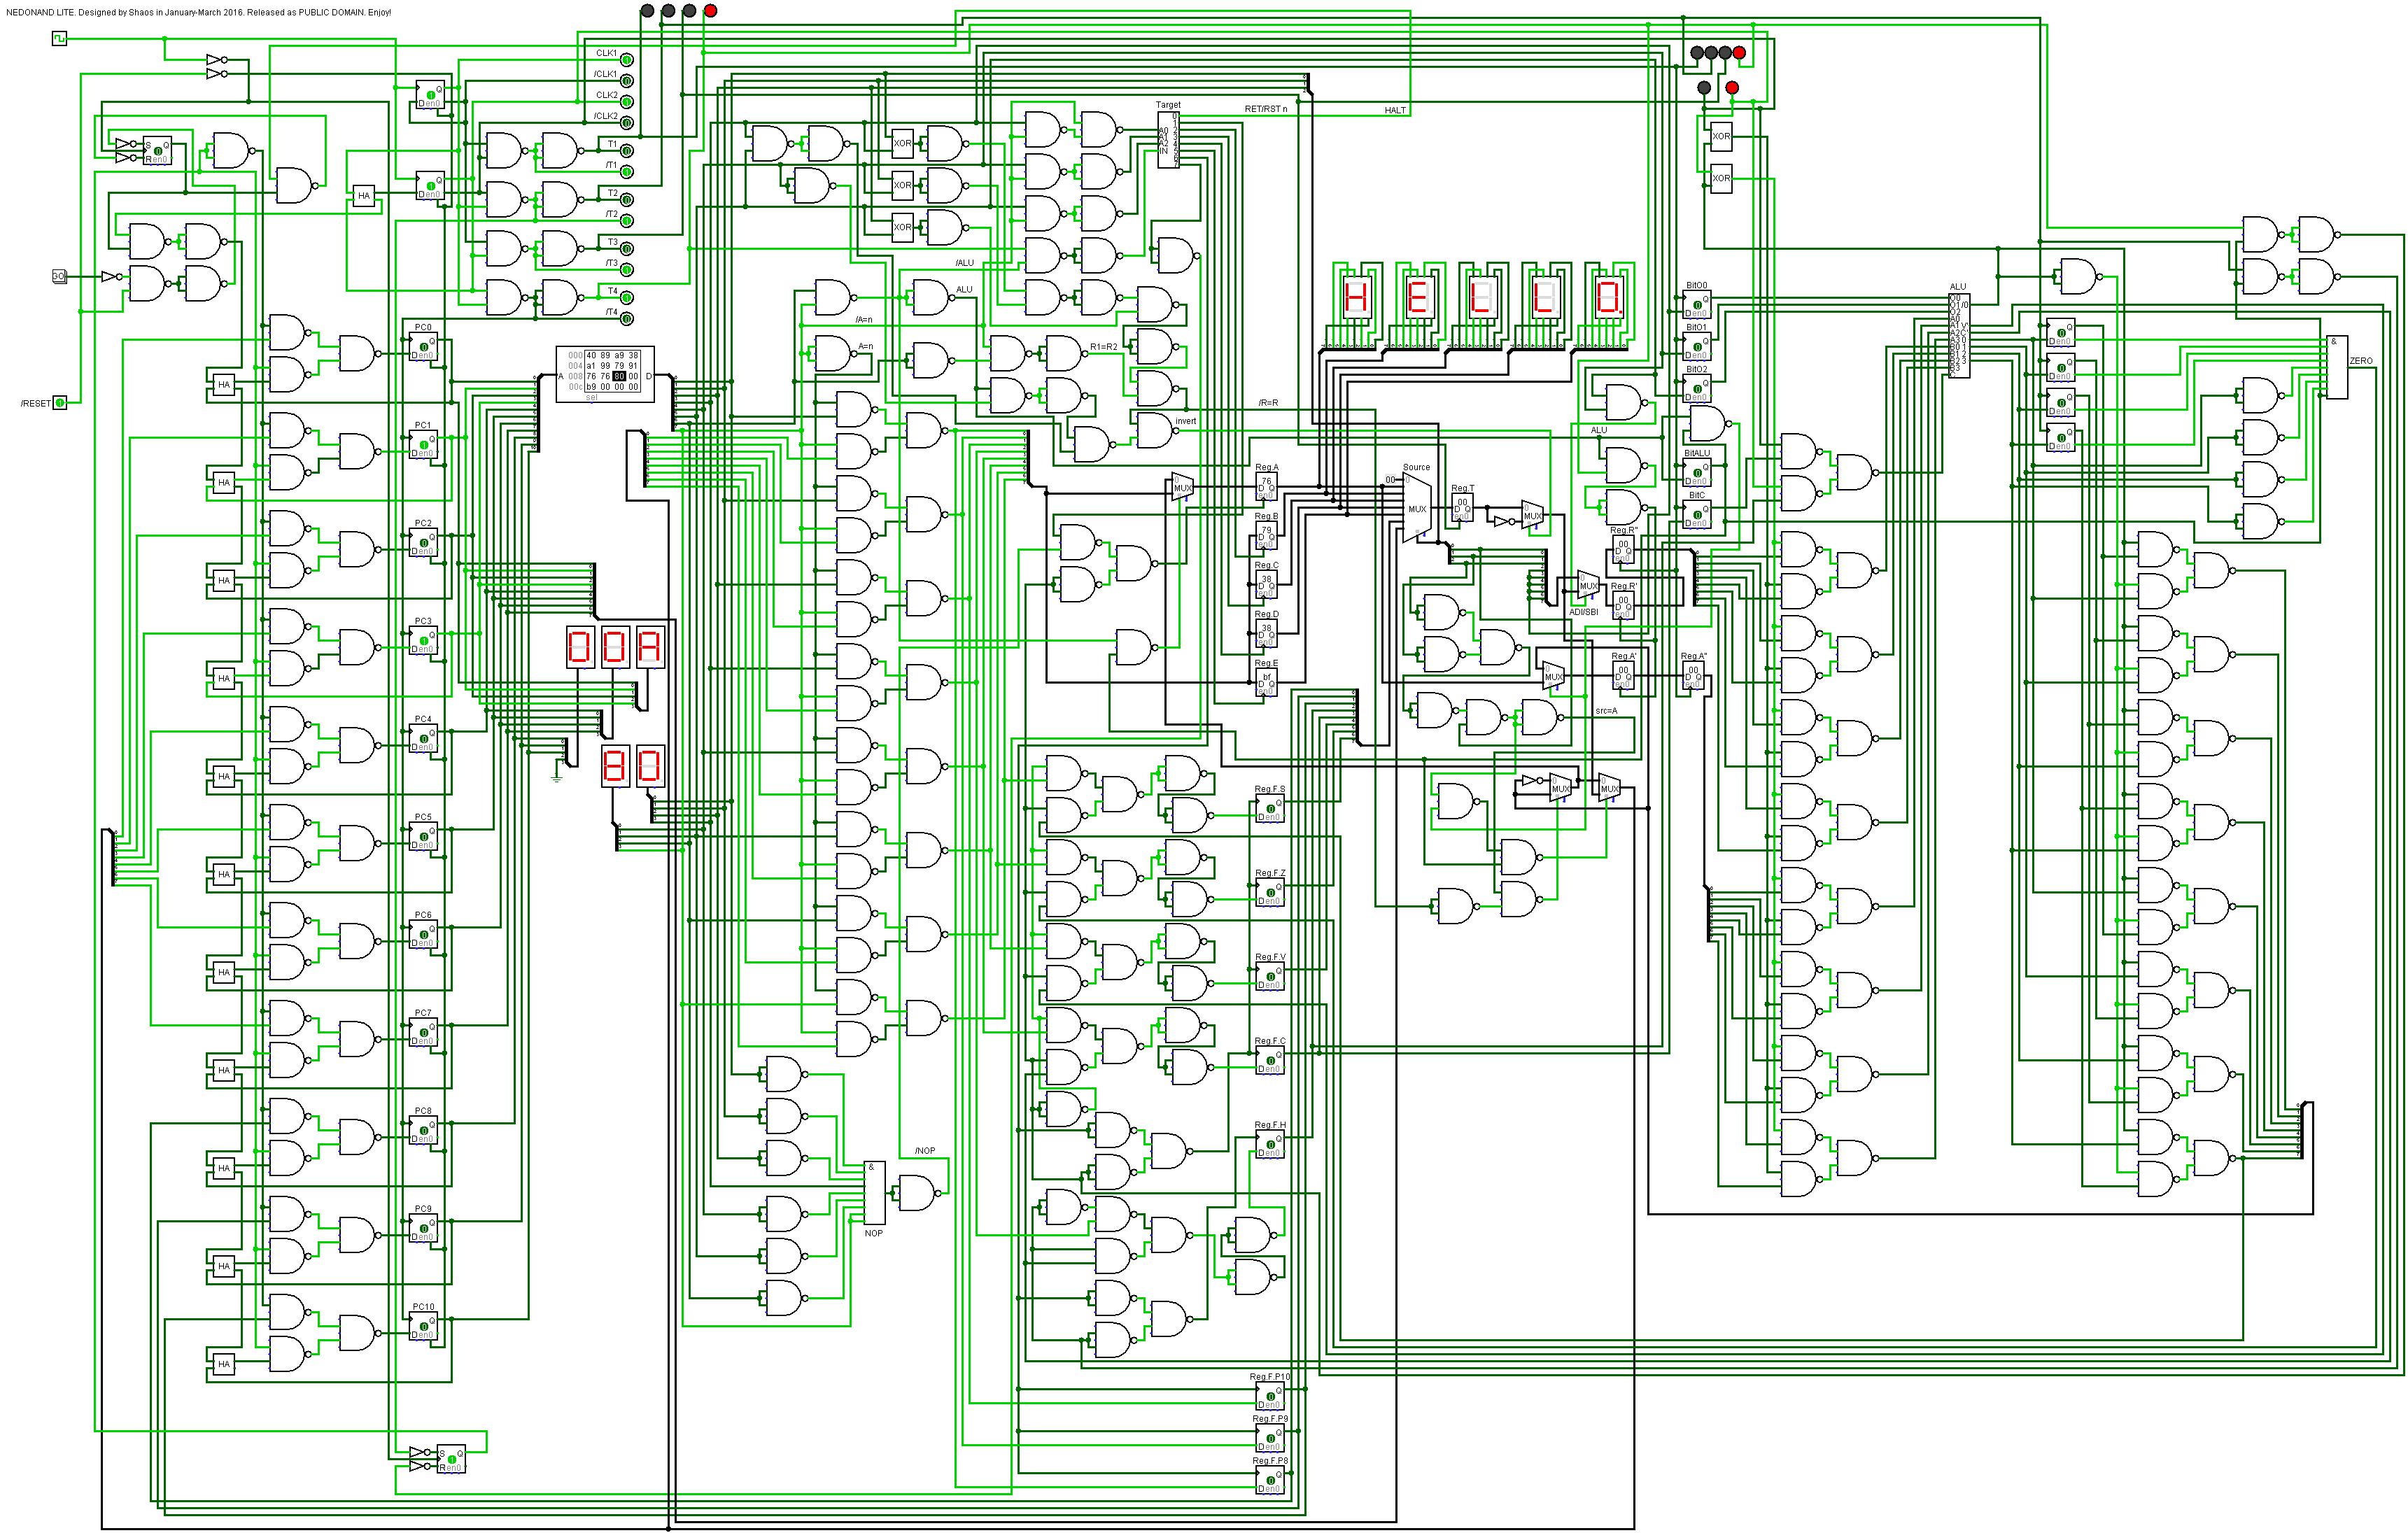 NEDONAND lite simulation is ready   Details   Hackaday io